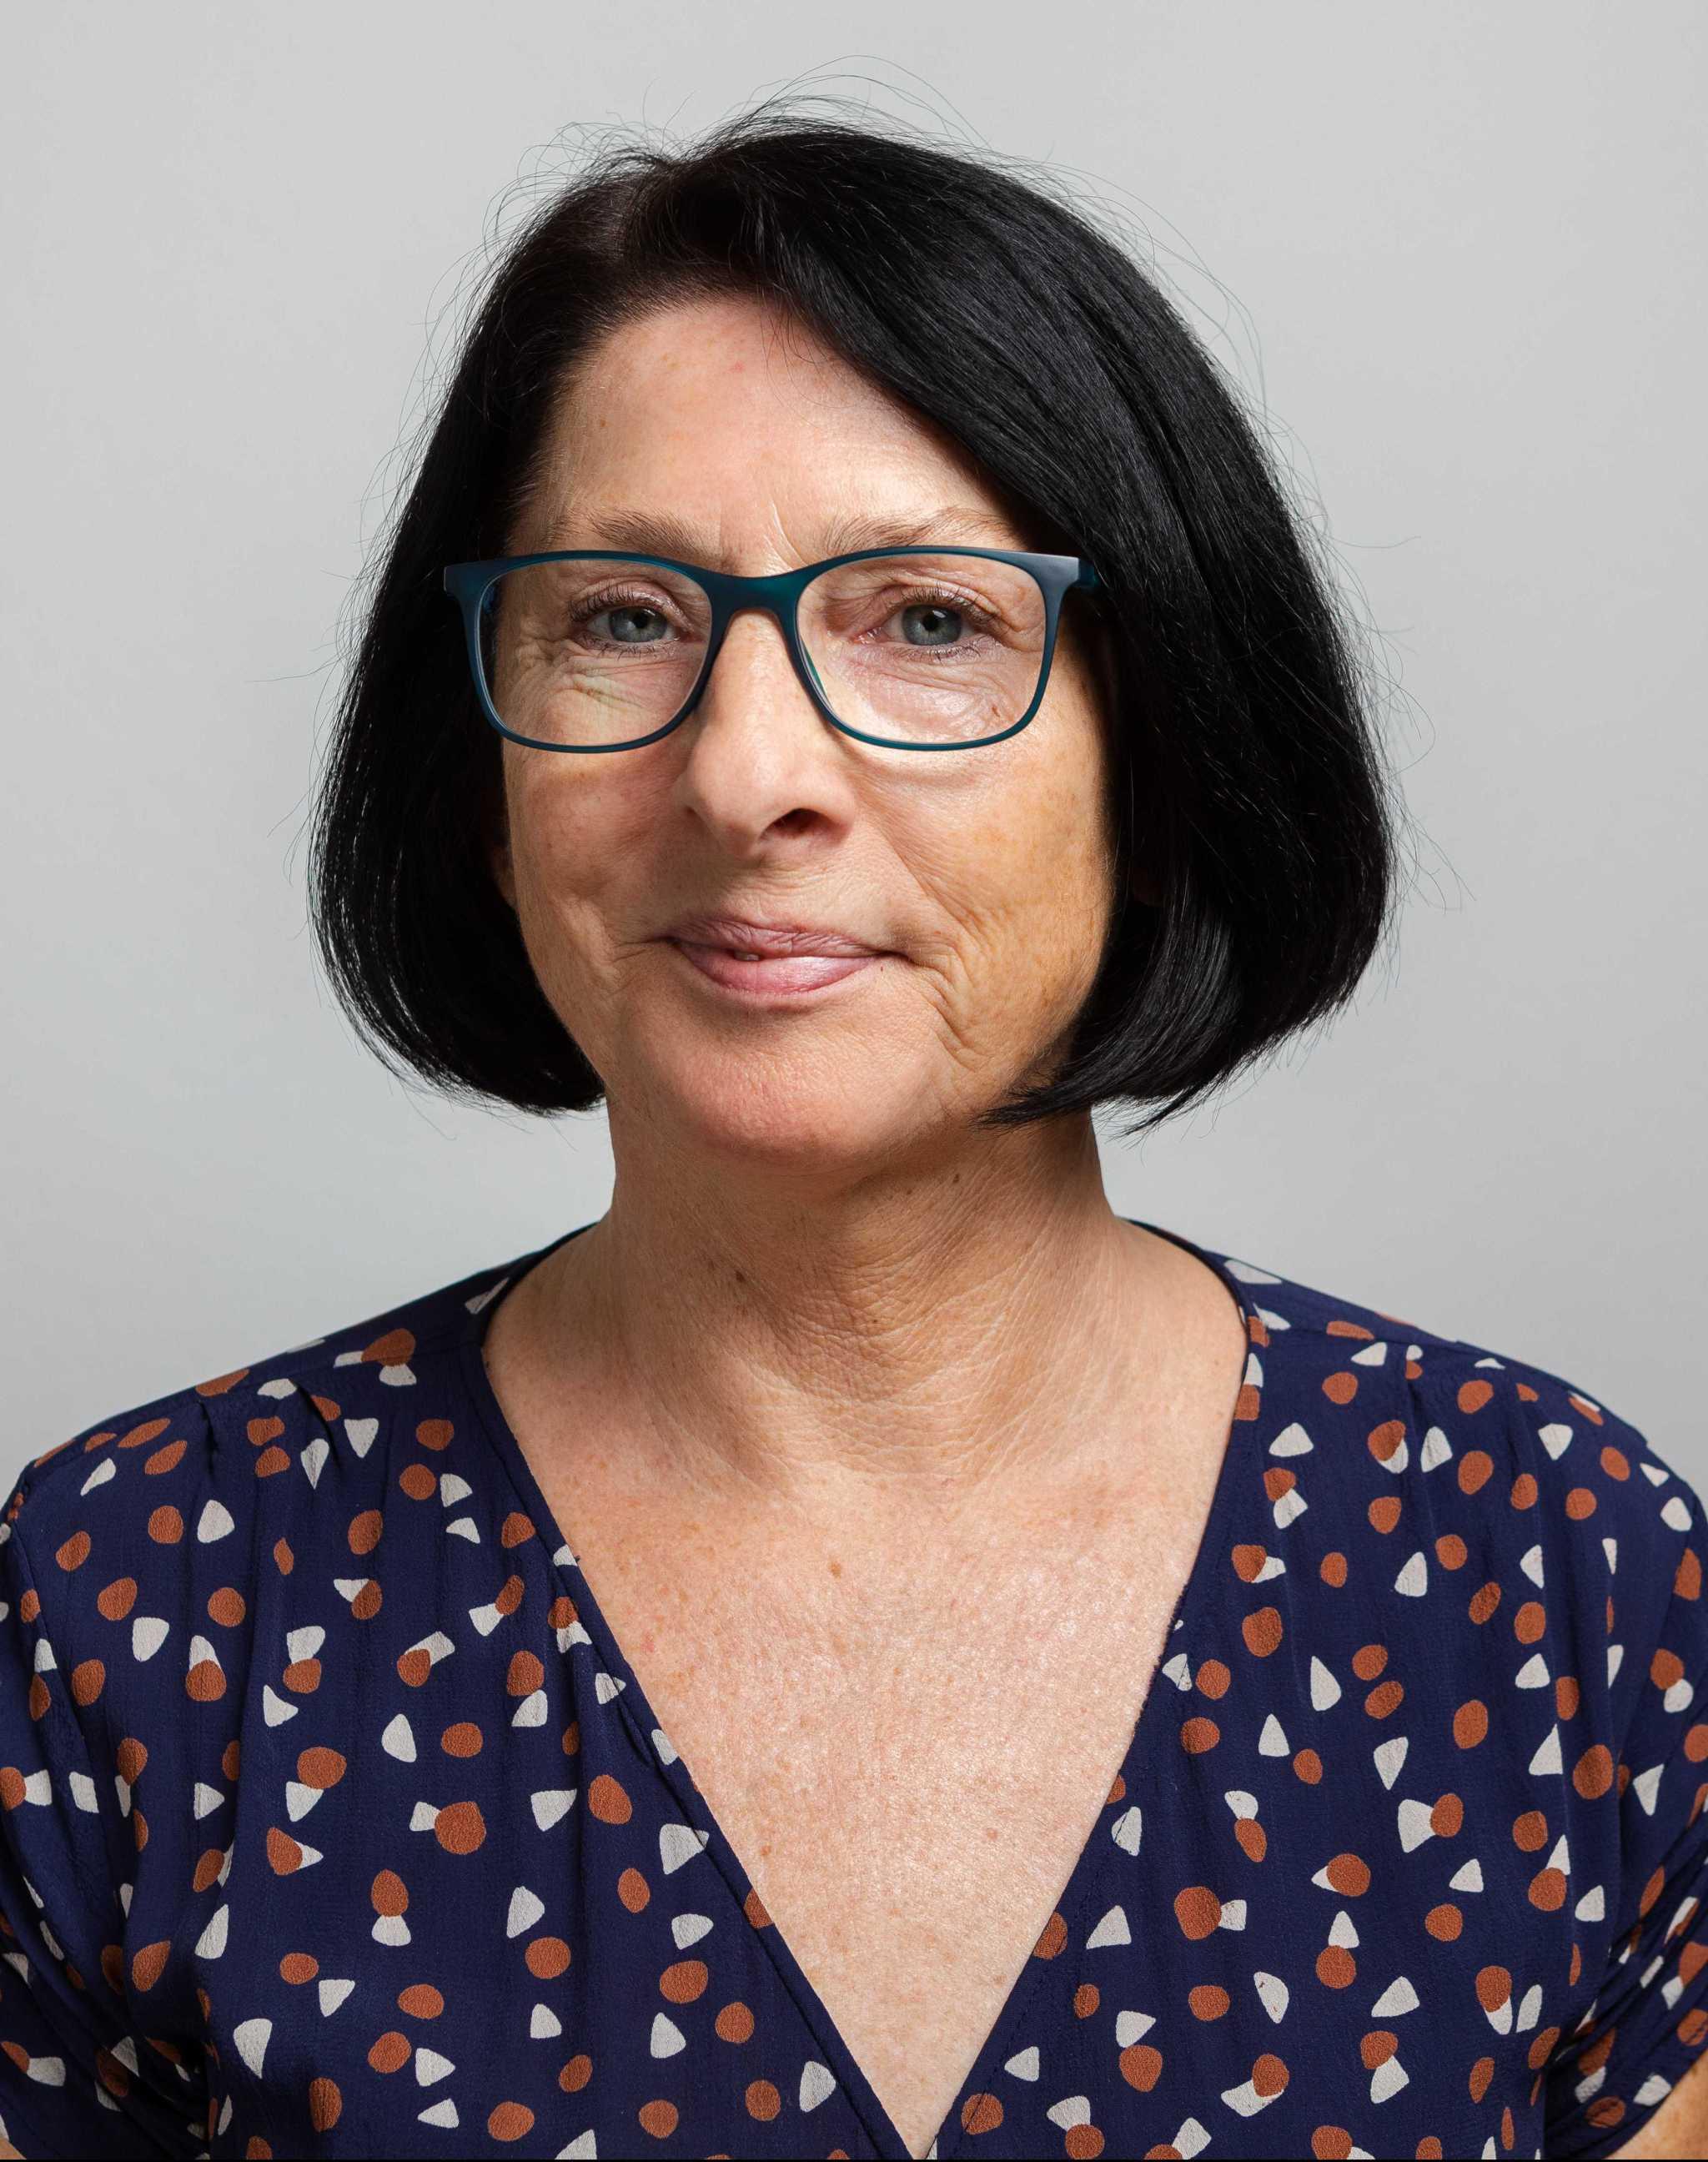 Sylvia Fielitz